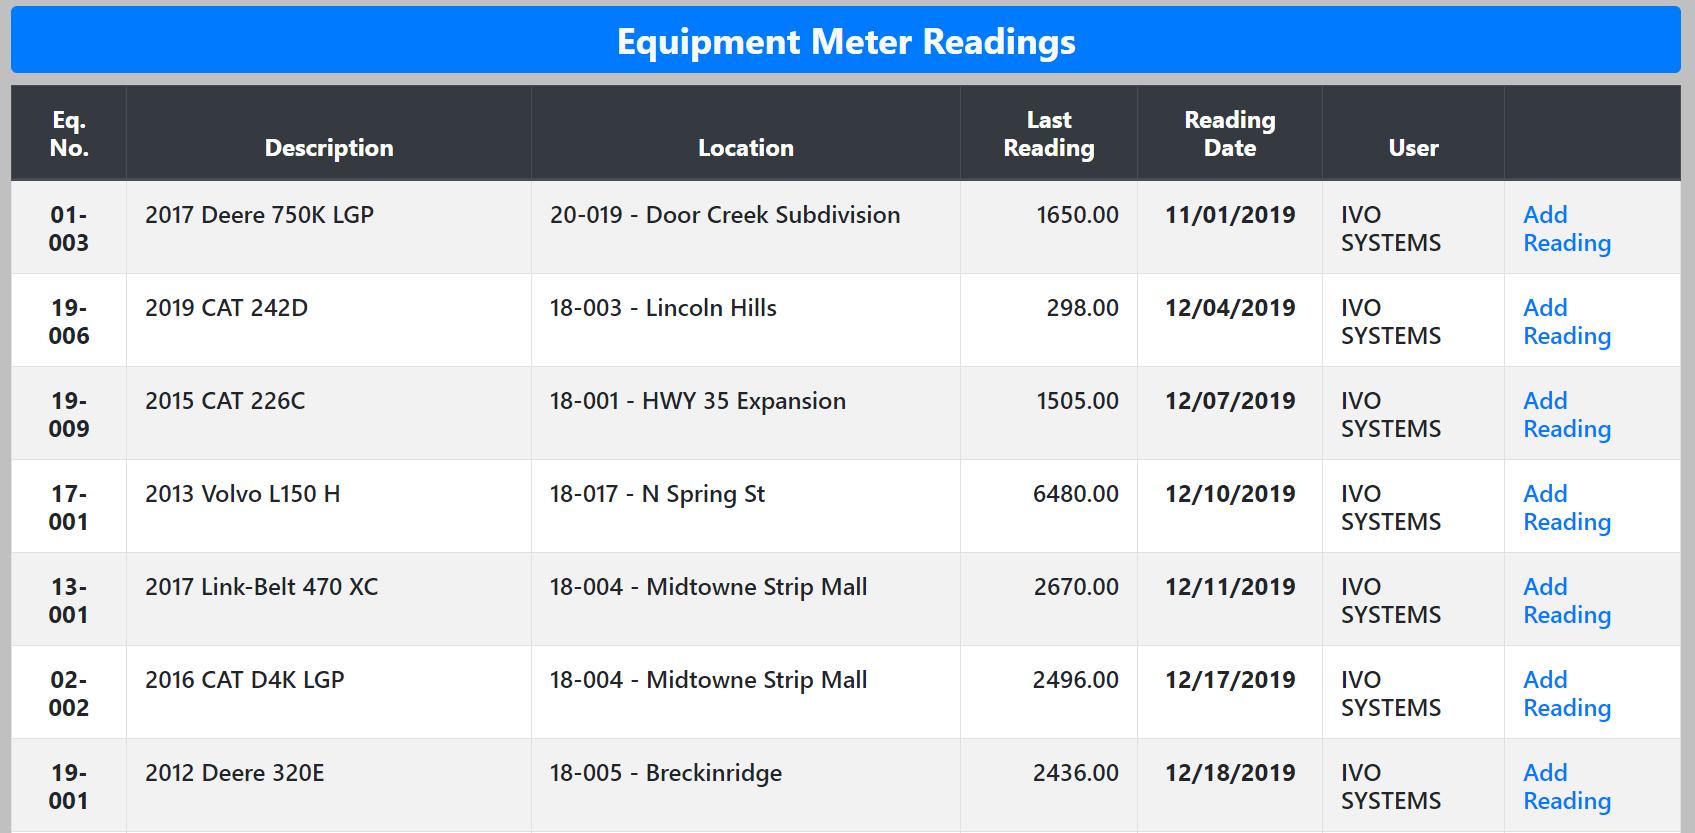 MaintainVO Hour Meters